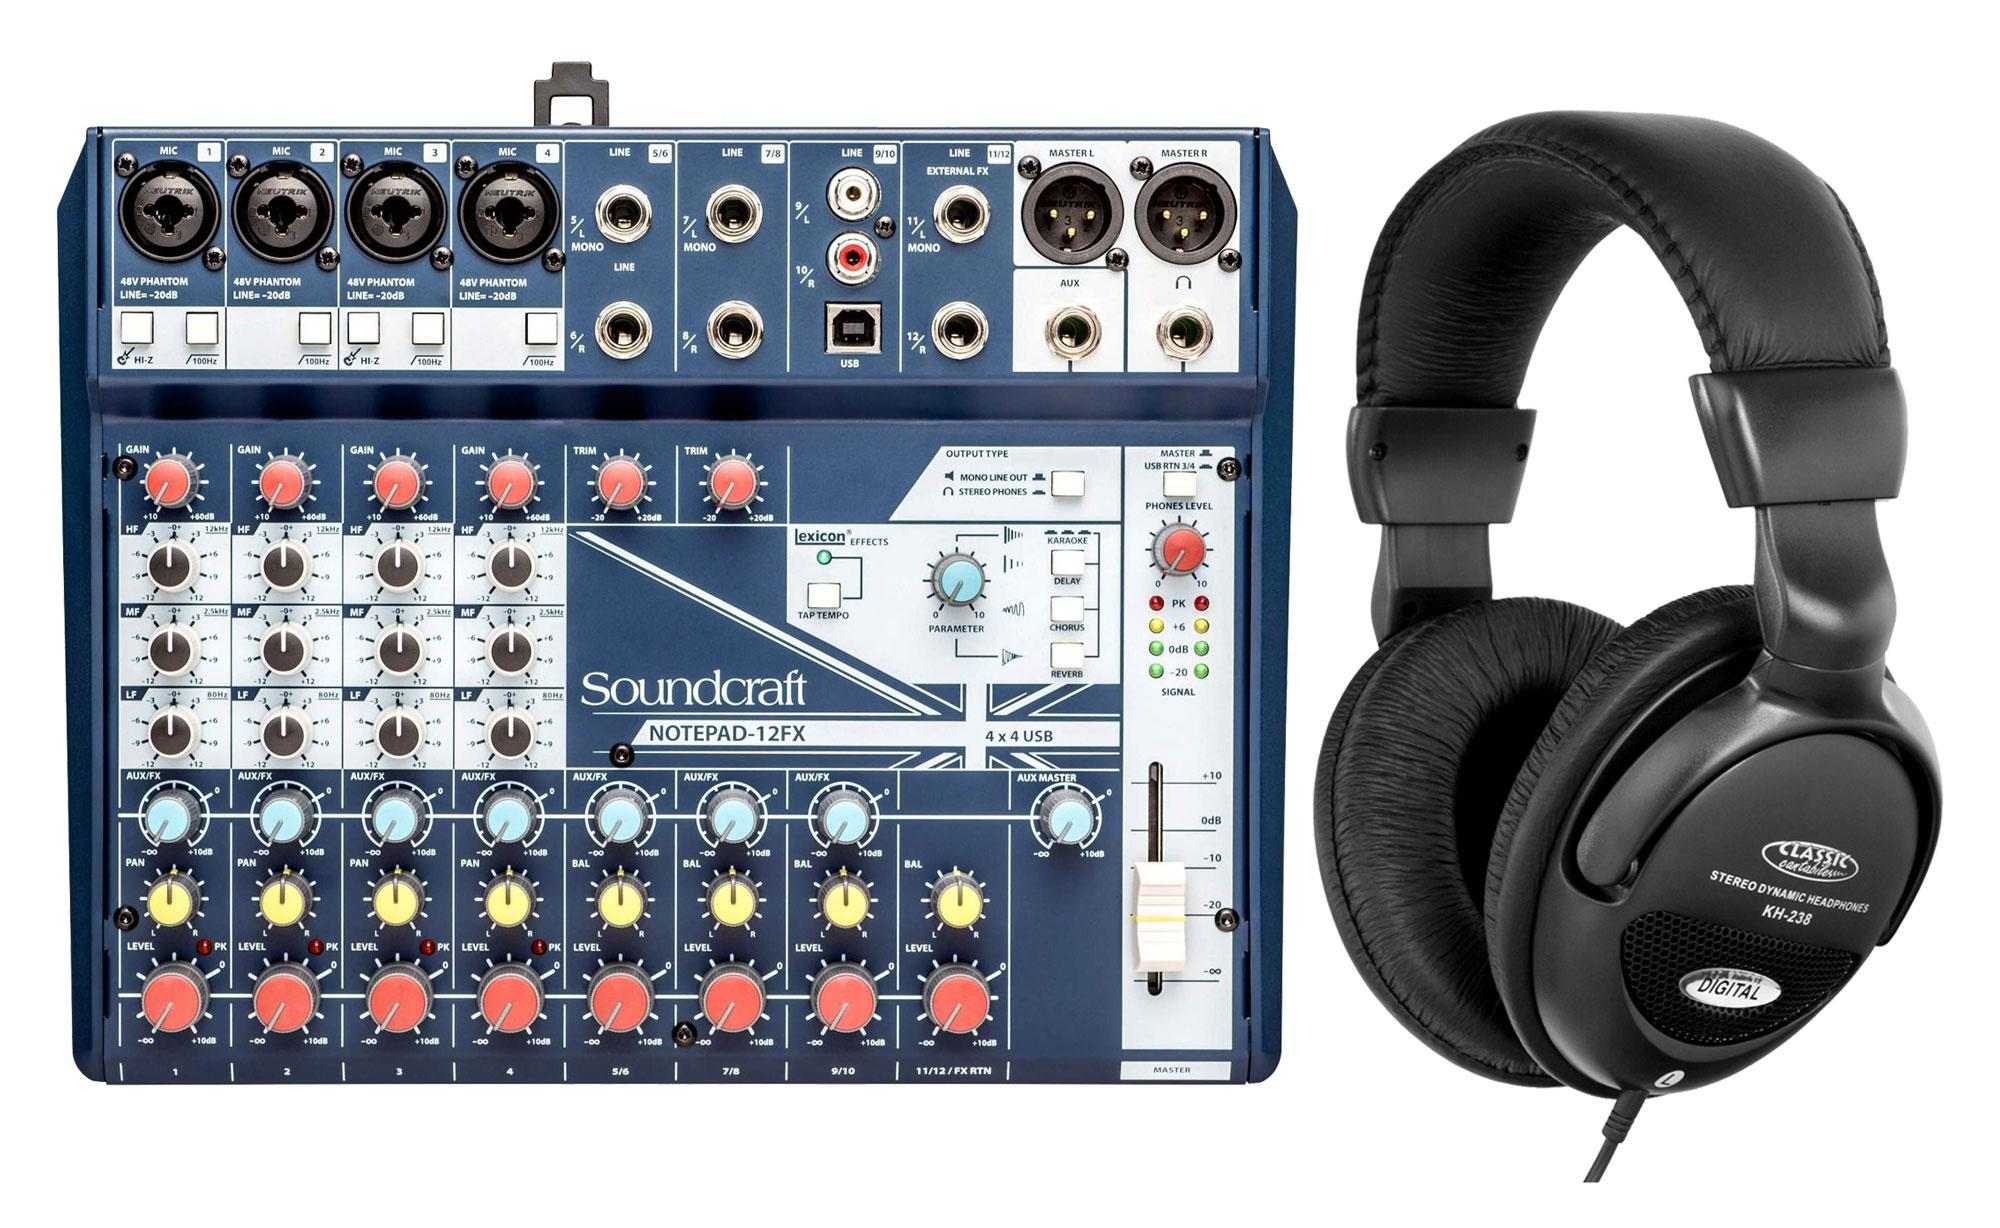 Mischpulte - Soundcraft Notepad 12FX Kompaktmischpult Set inkl. Kopfhörer - Onlineshop Musikhaus Kirstein